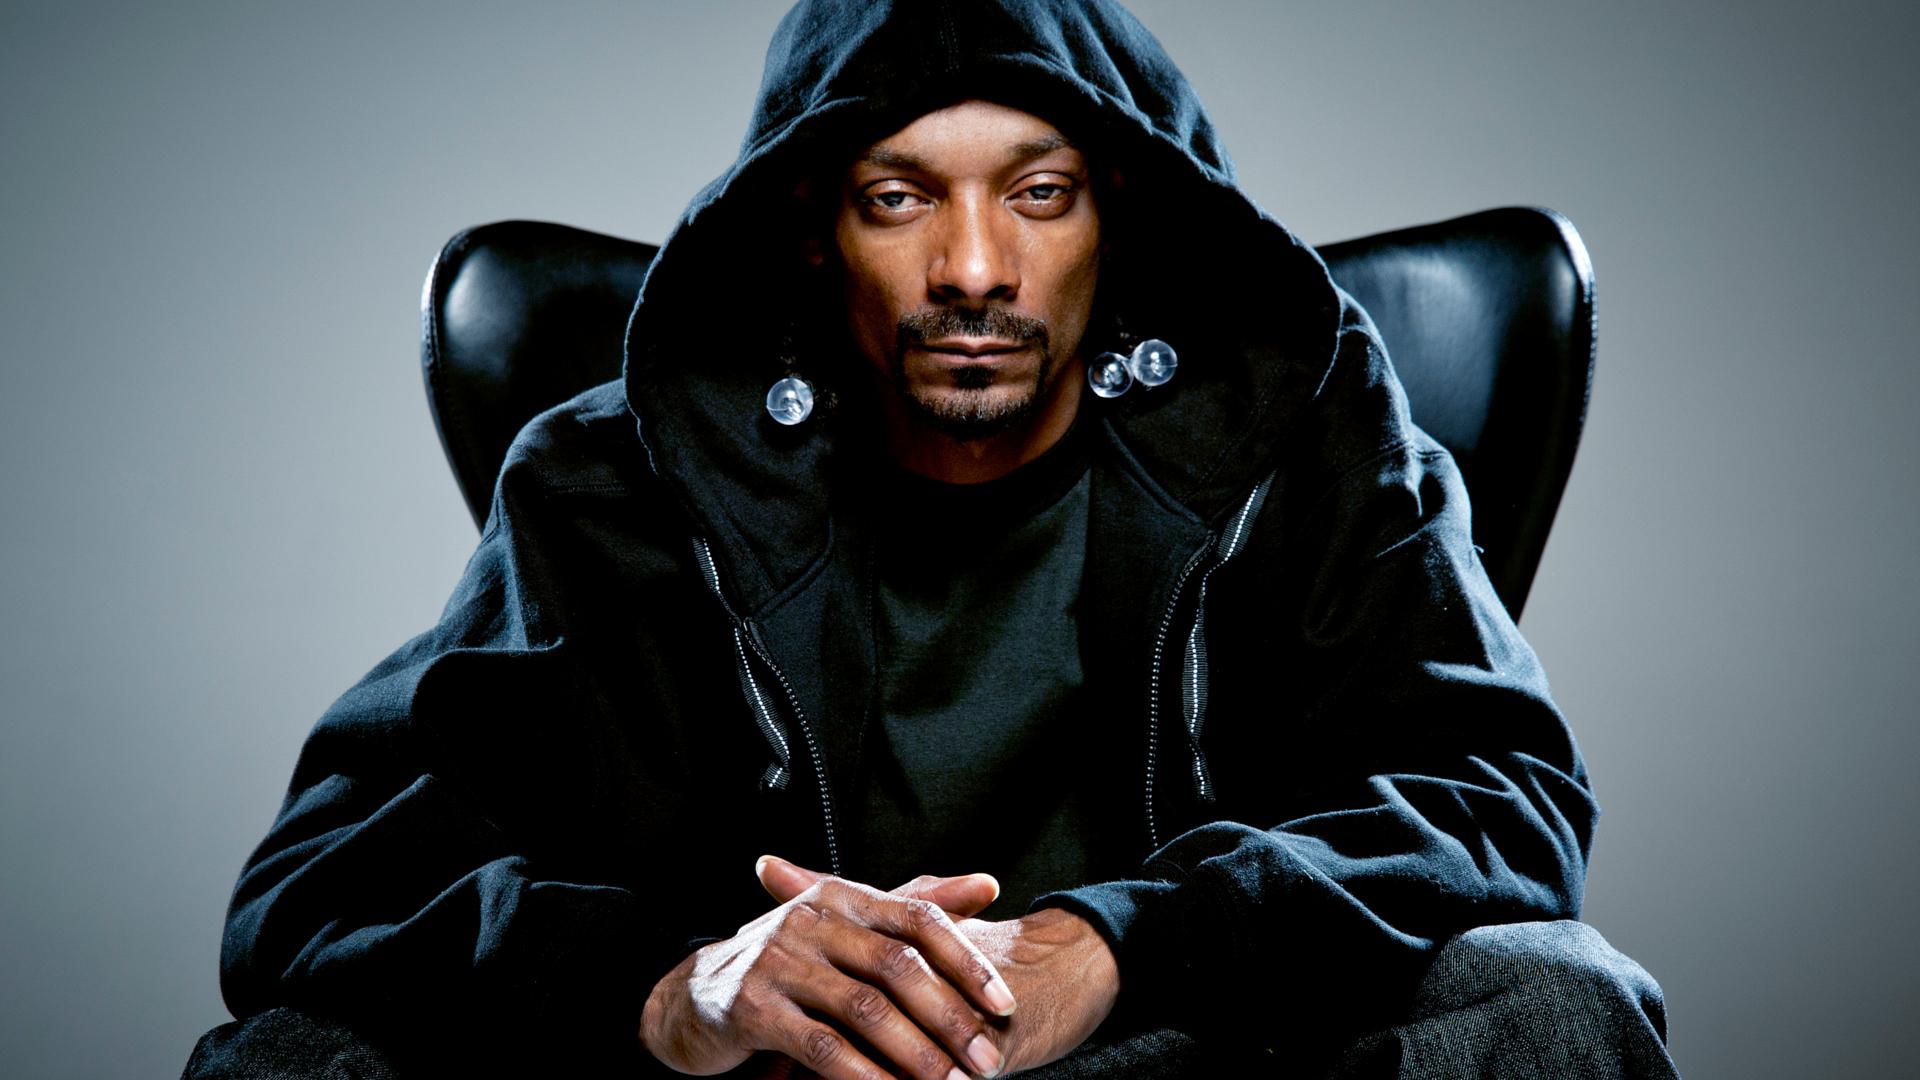 Peaches N Cream av Snoop Dogg